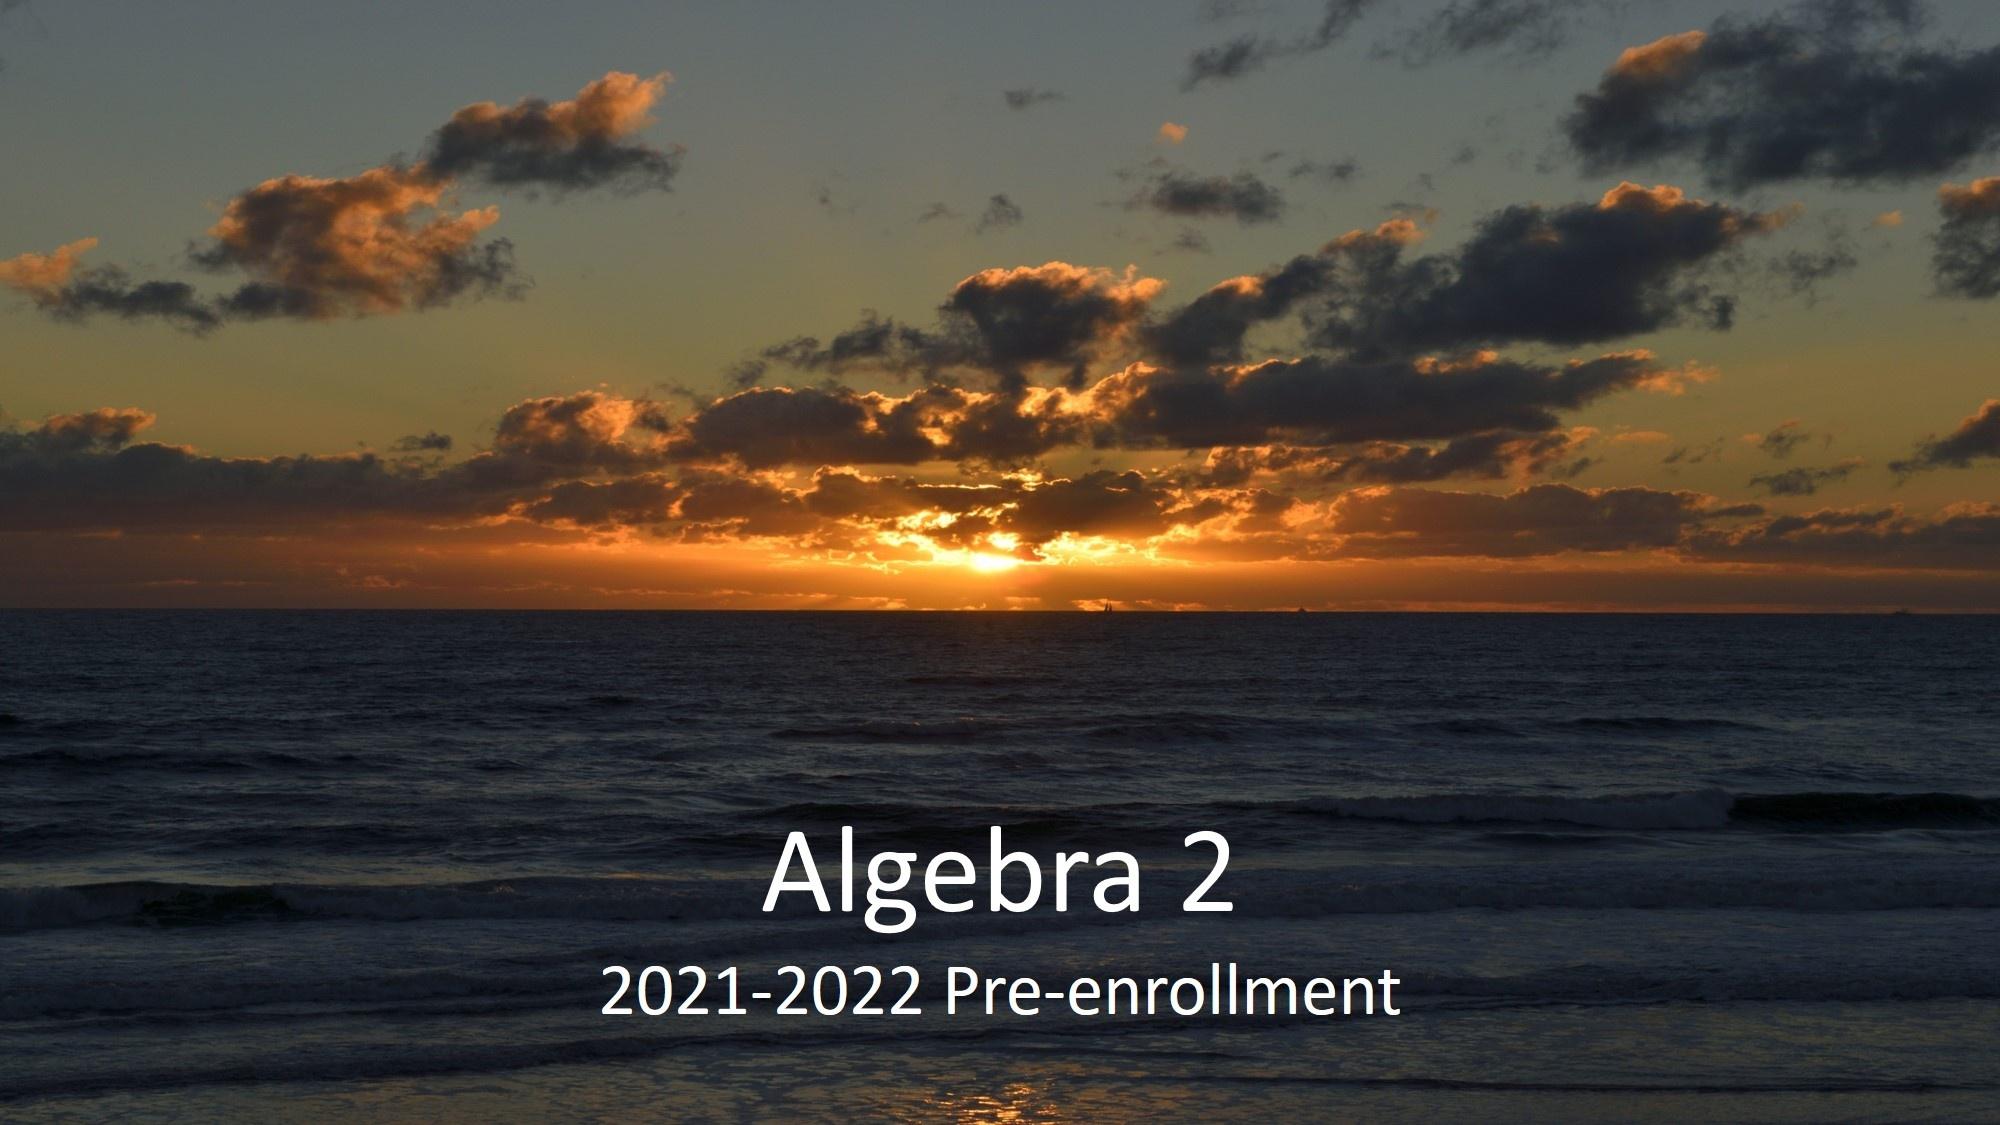 Algebra 2, Section 2: 2021-2022 Pre-enrollment